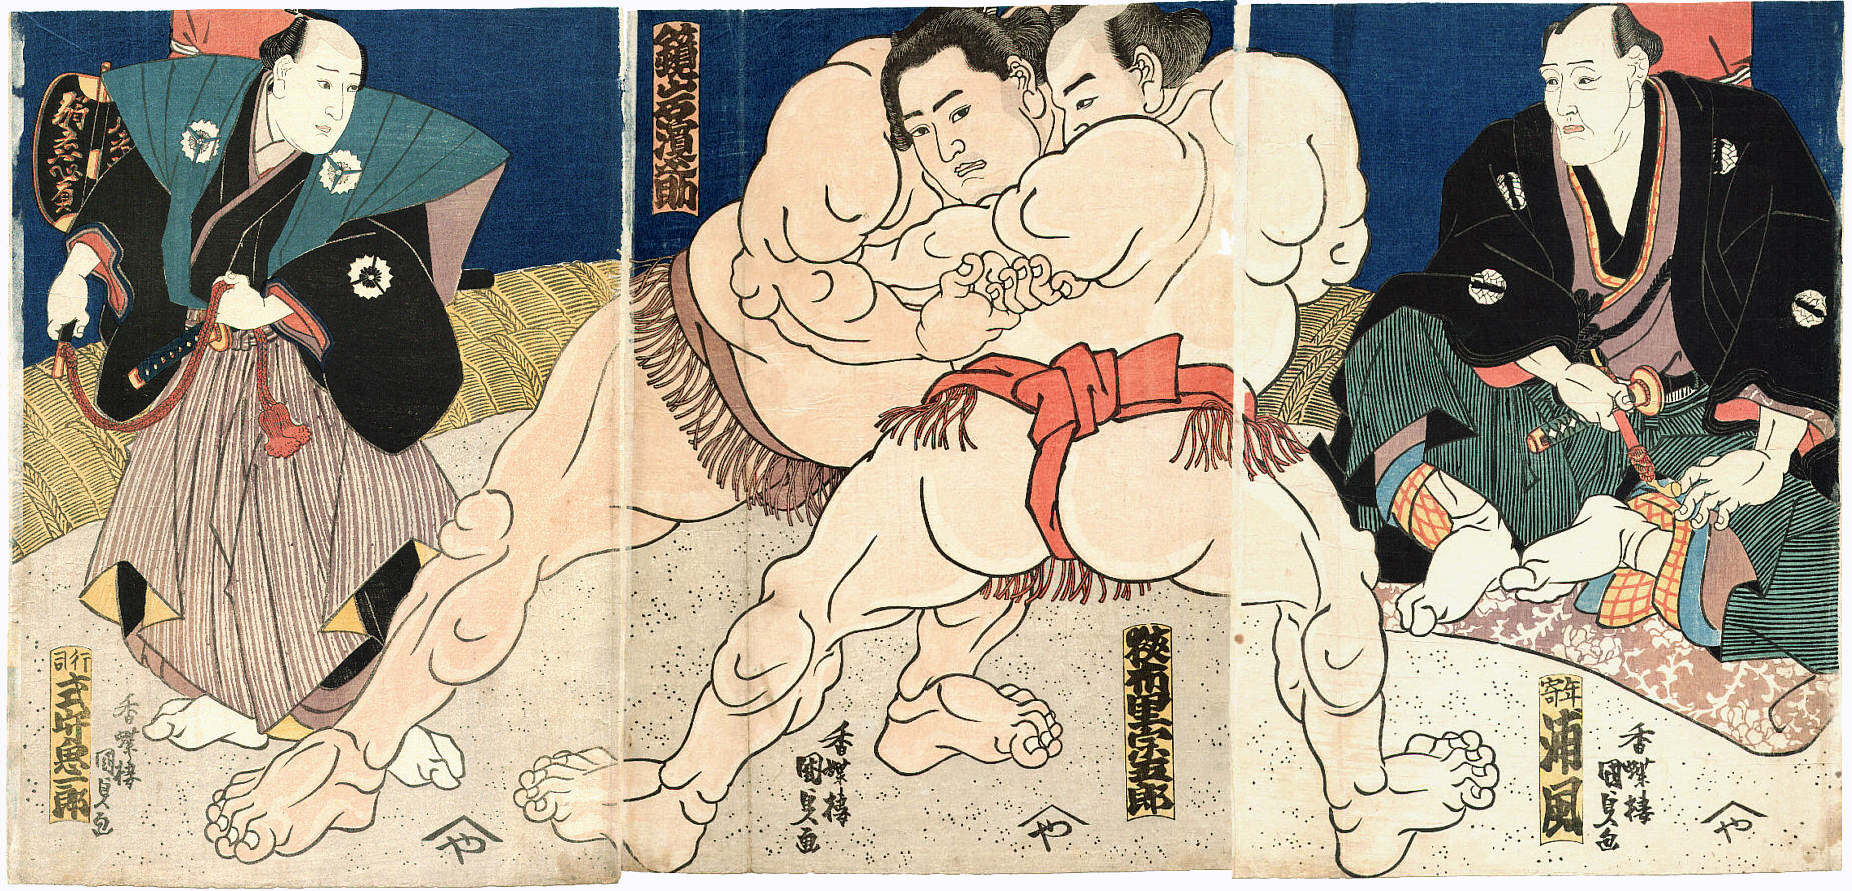 Kunisada_Sumo_Triptychon_c1860s.jpg